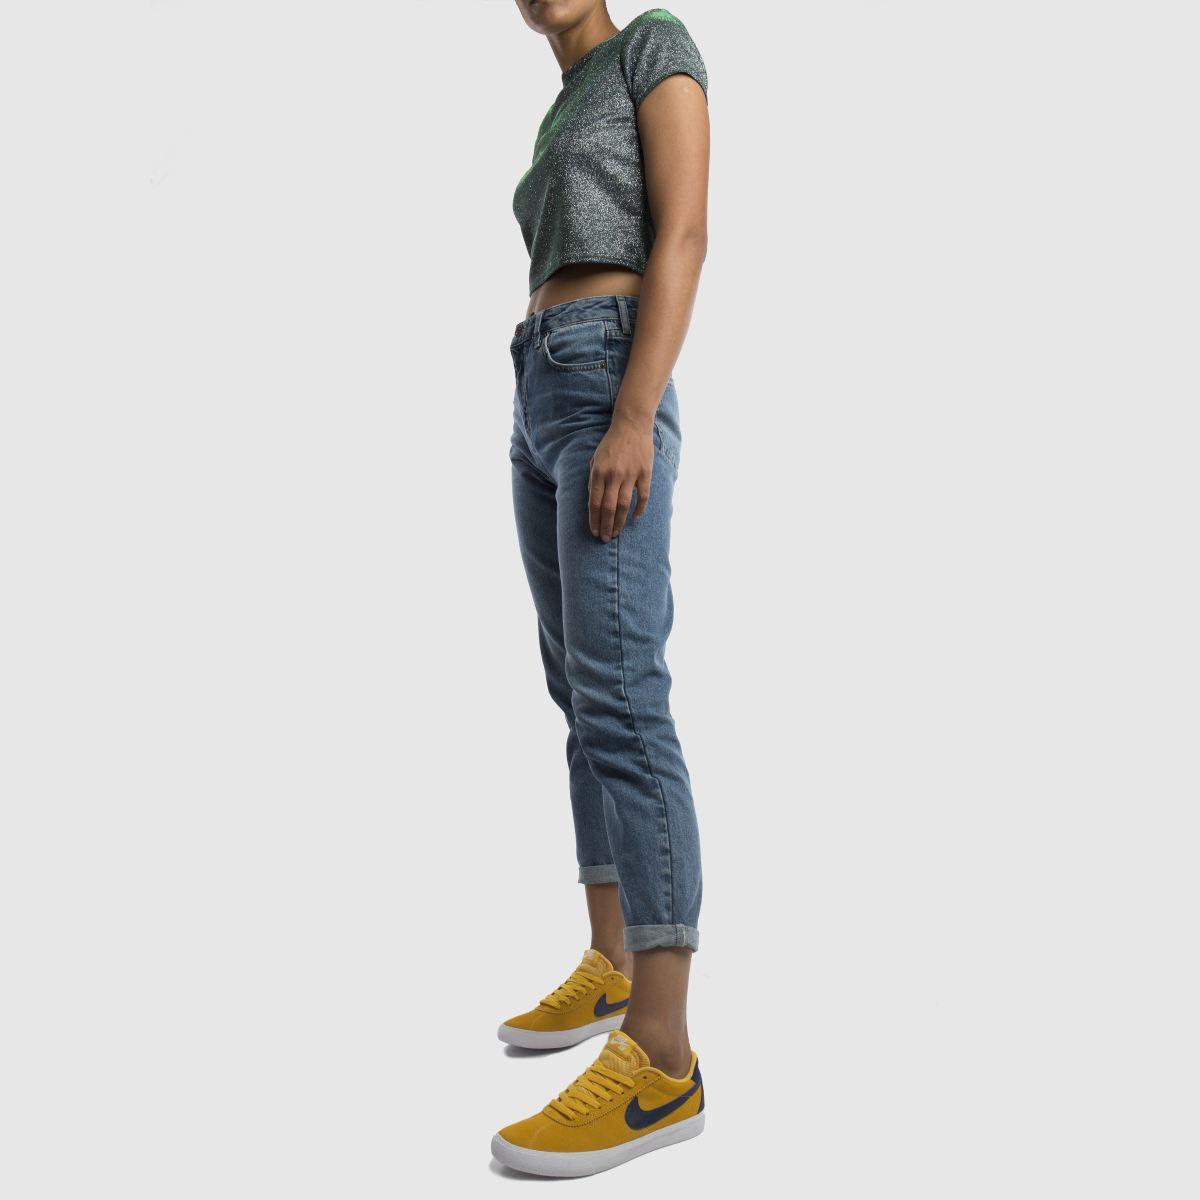 Damen Gelb nike sb Bruin Low Qualität Sneaker | schuh Gute Qualität Low beliebte Schuhe c15e0f